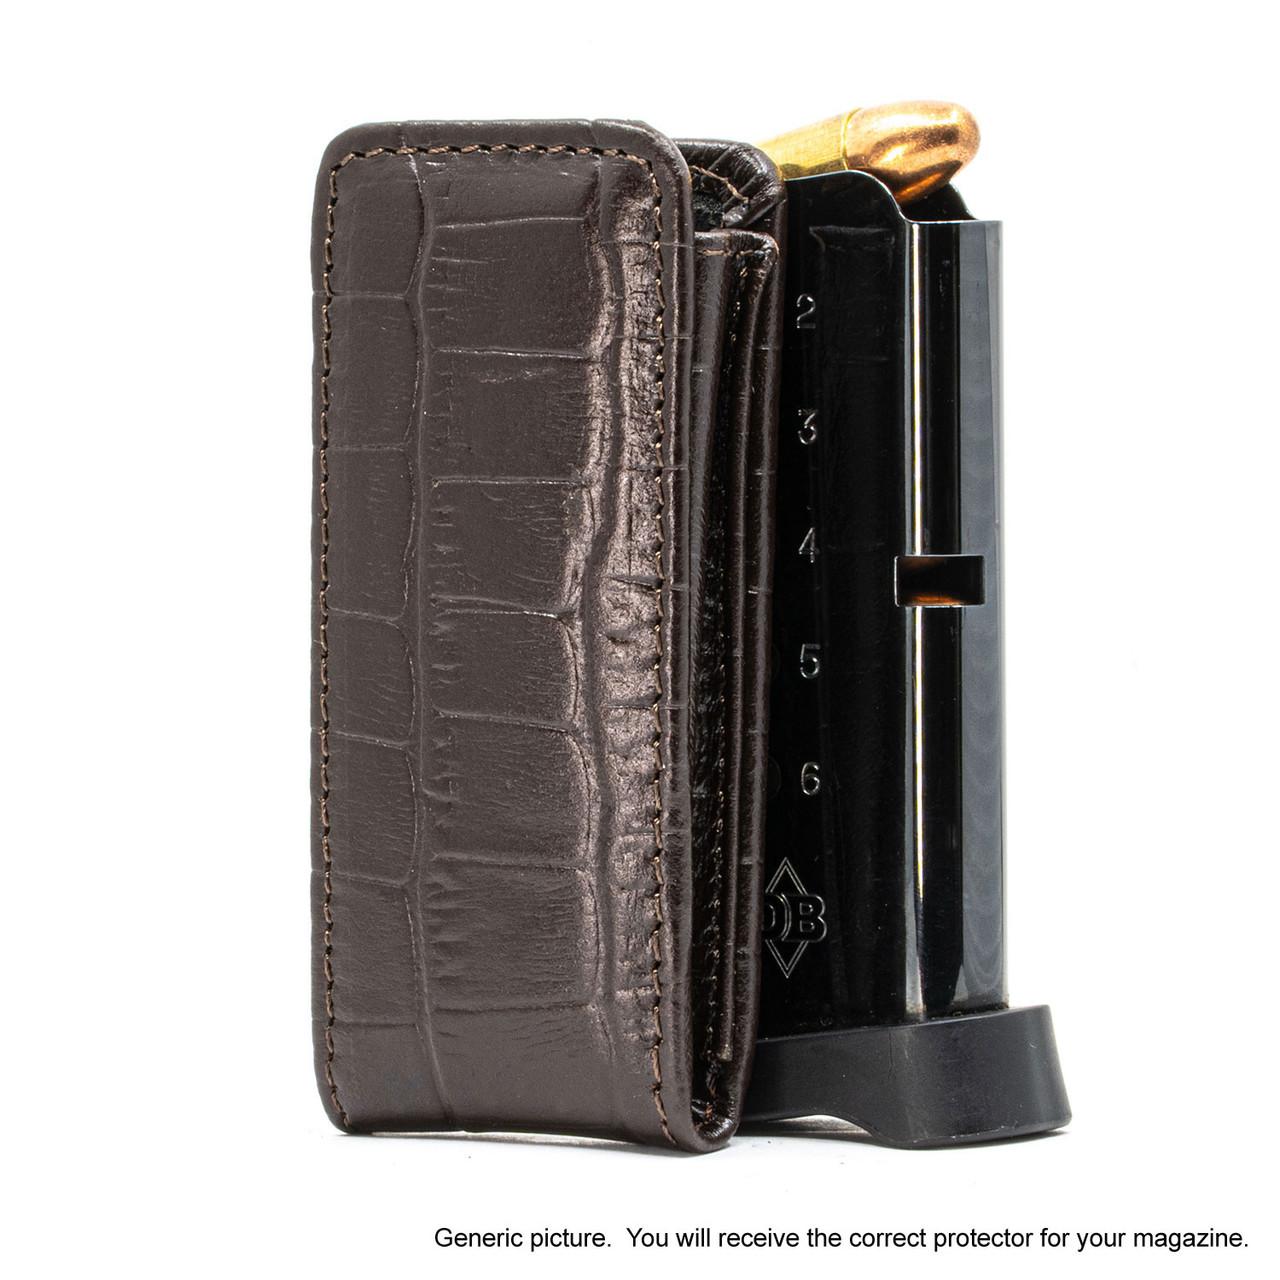 Browning 1911 .380 Brown Alligator Magazine Pocket Protector